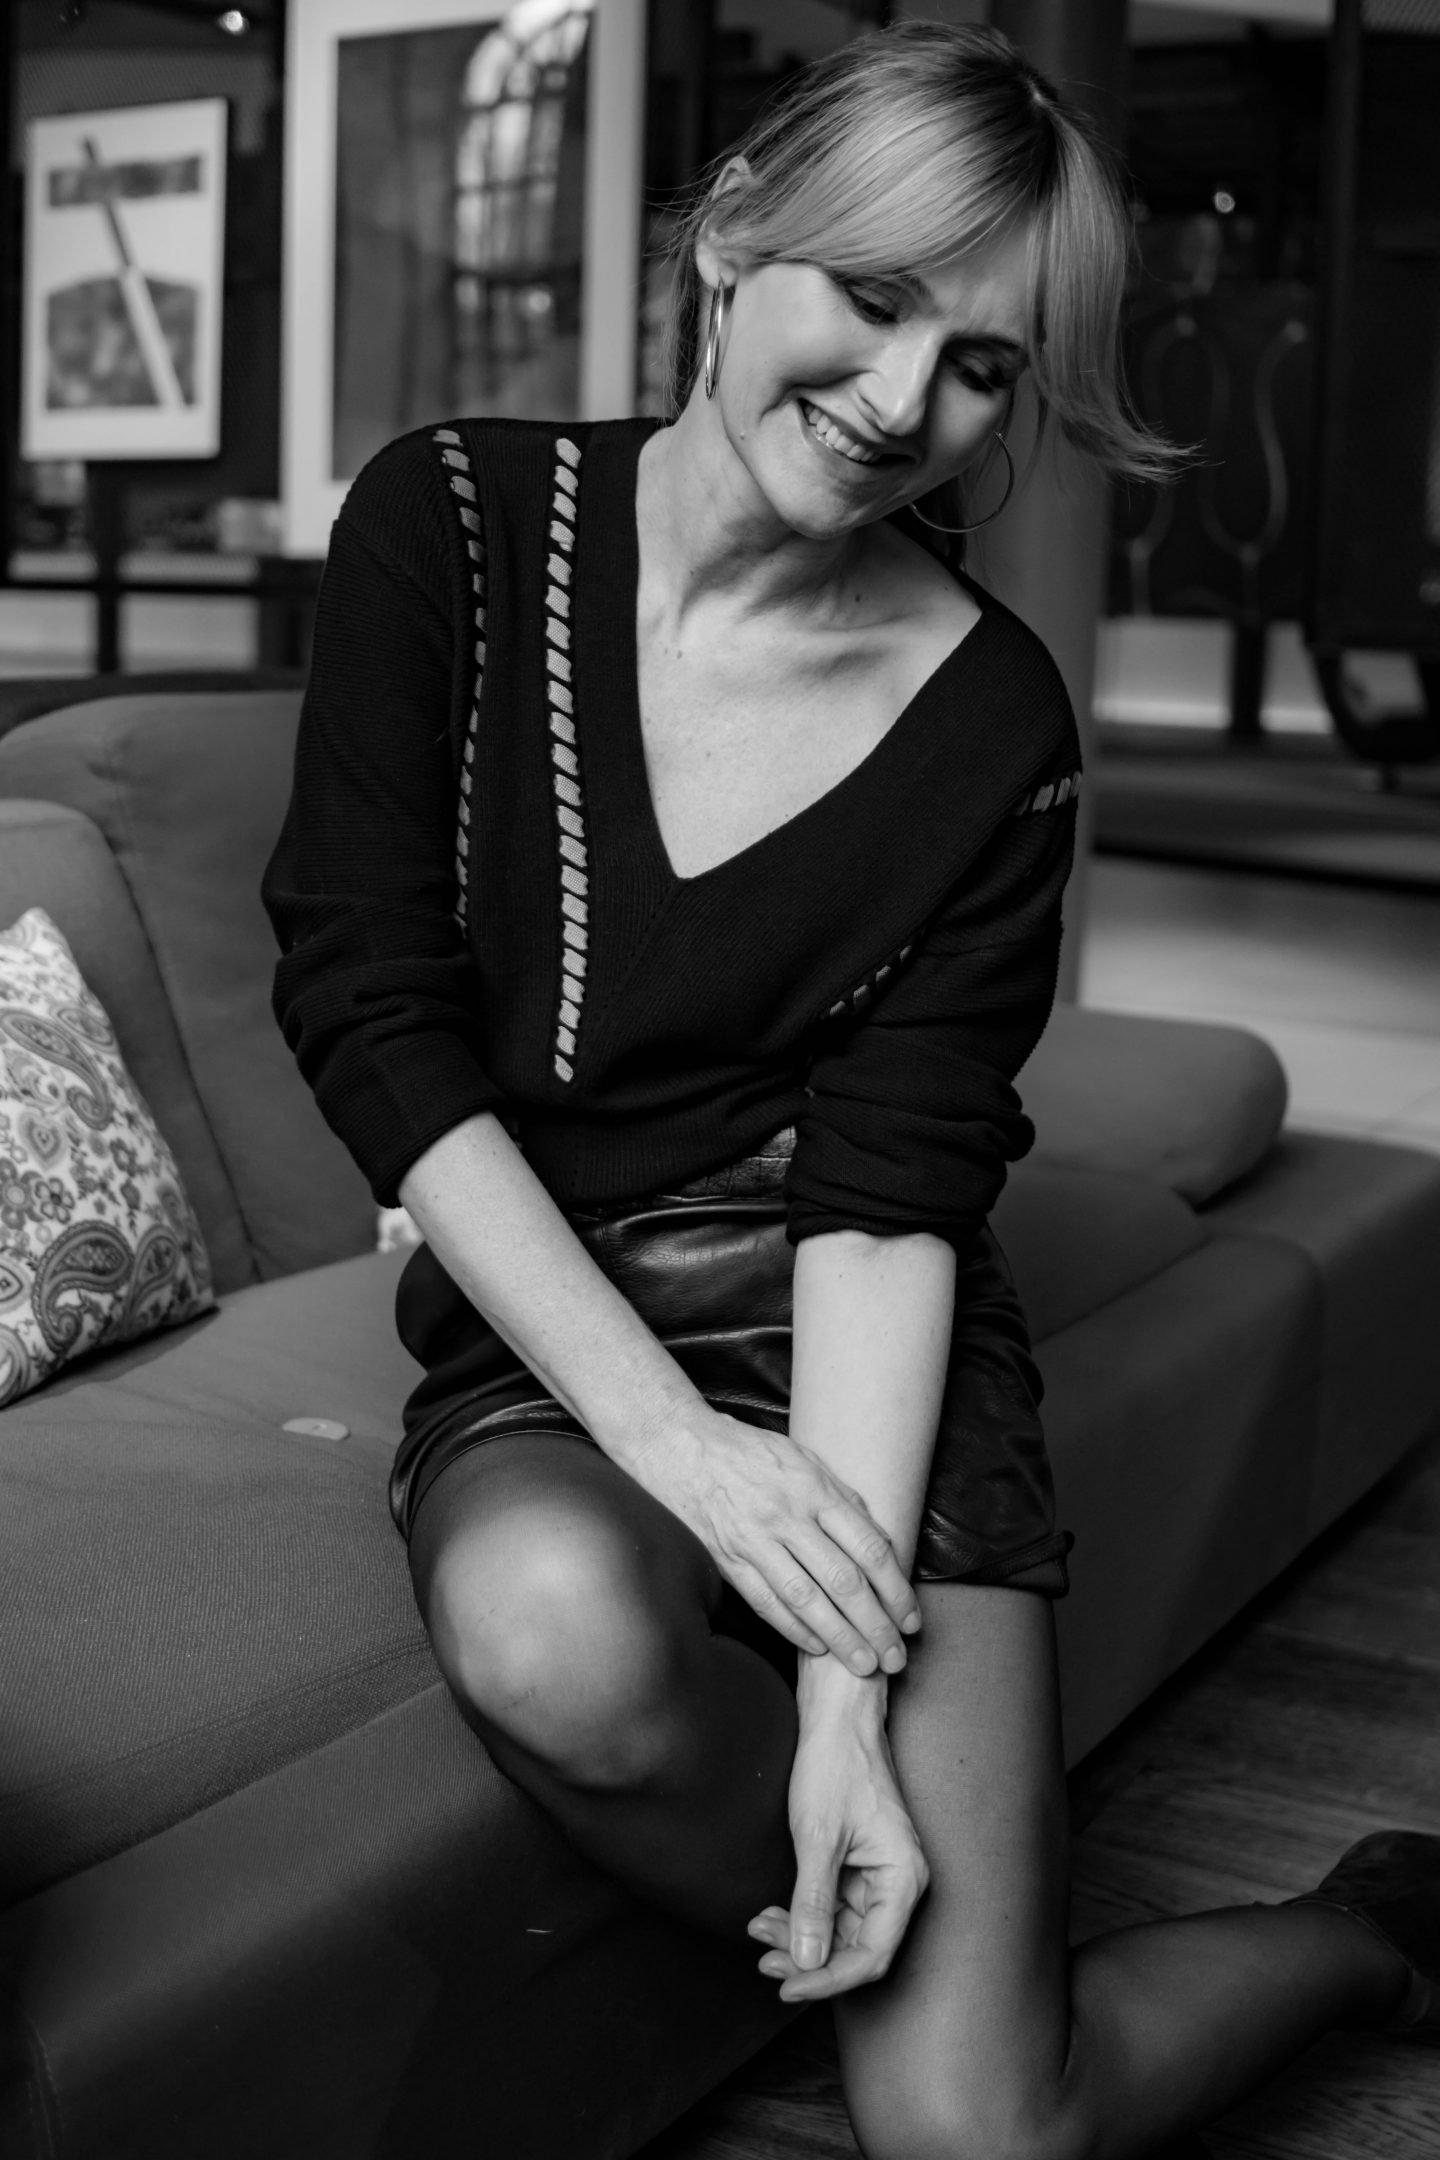 WENZ Pullover-Amy Vermont-zu Lederrock-Nowshine ü40 Blog im Andels Hotel Lodz